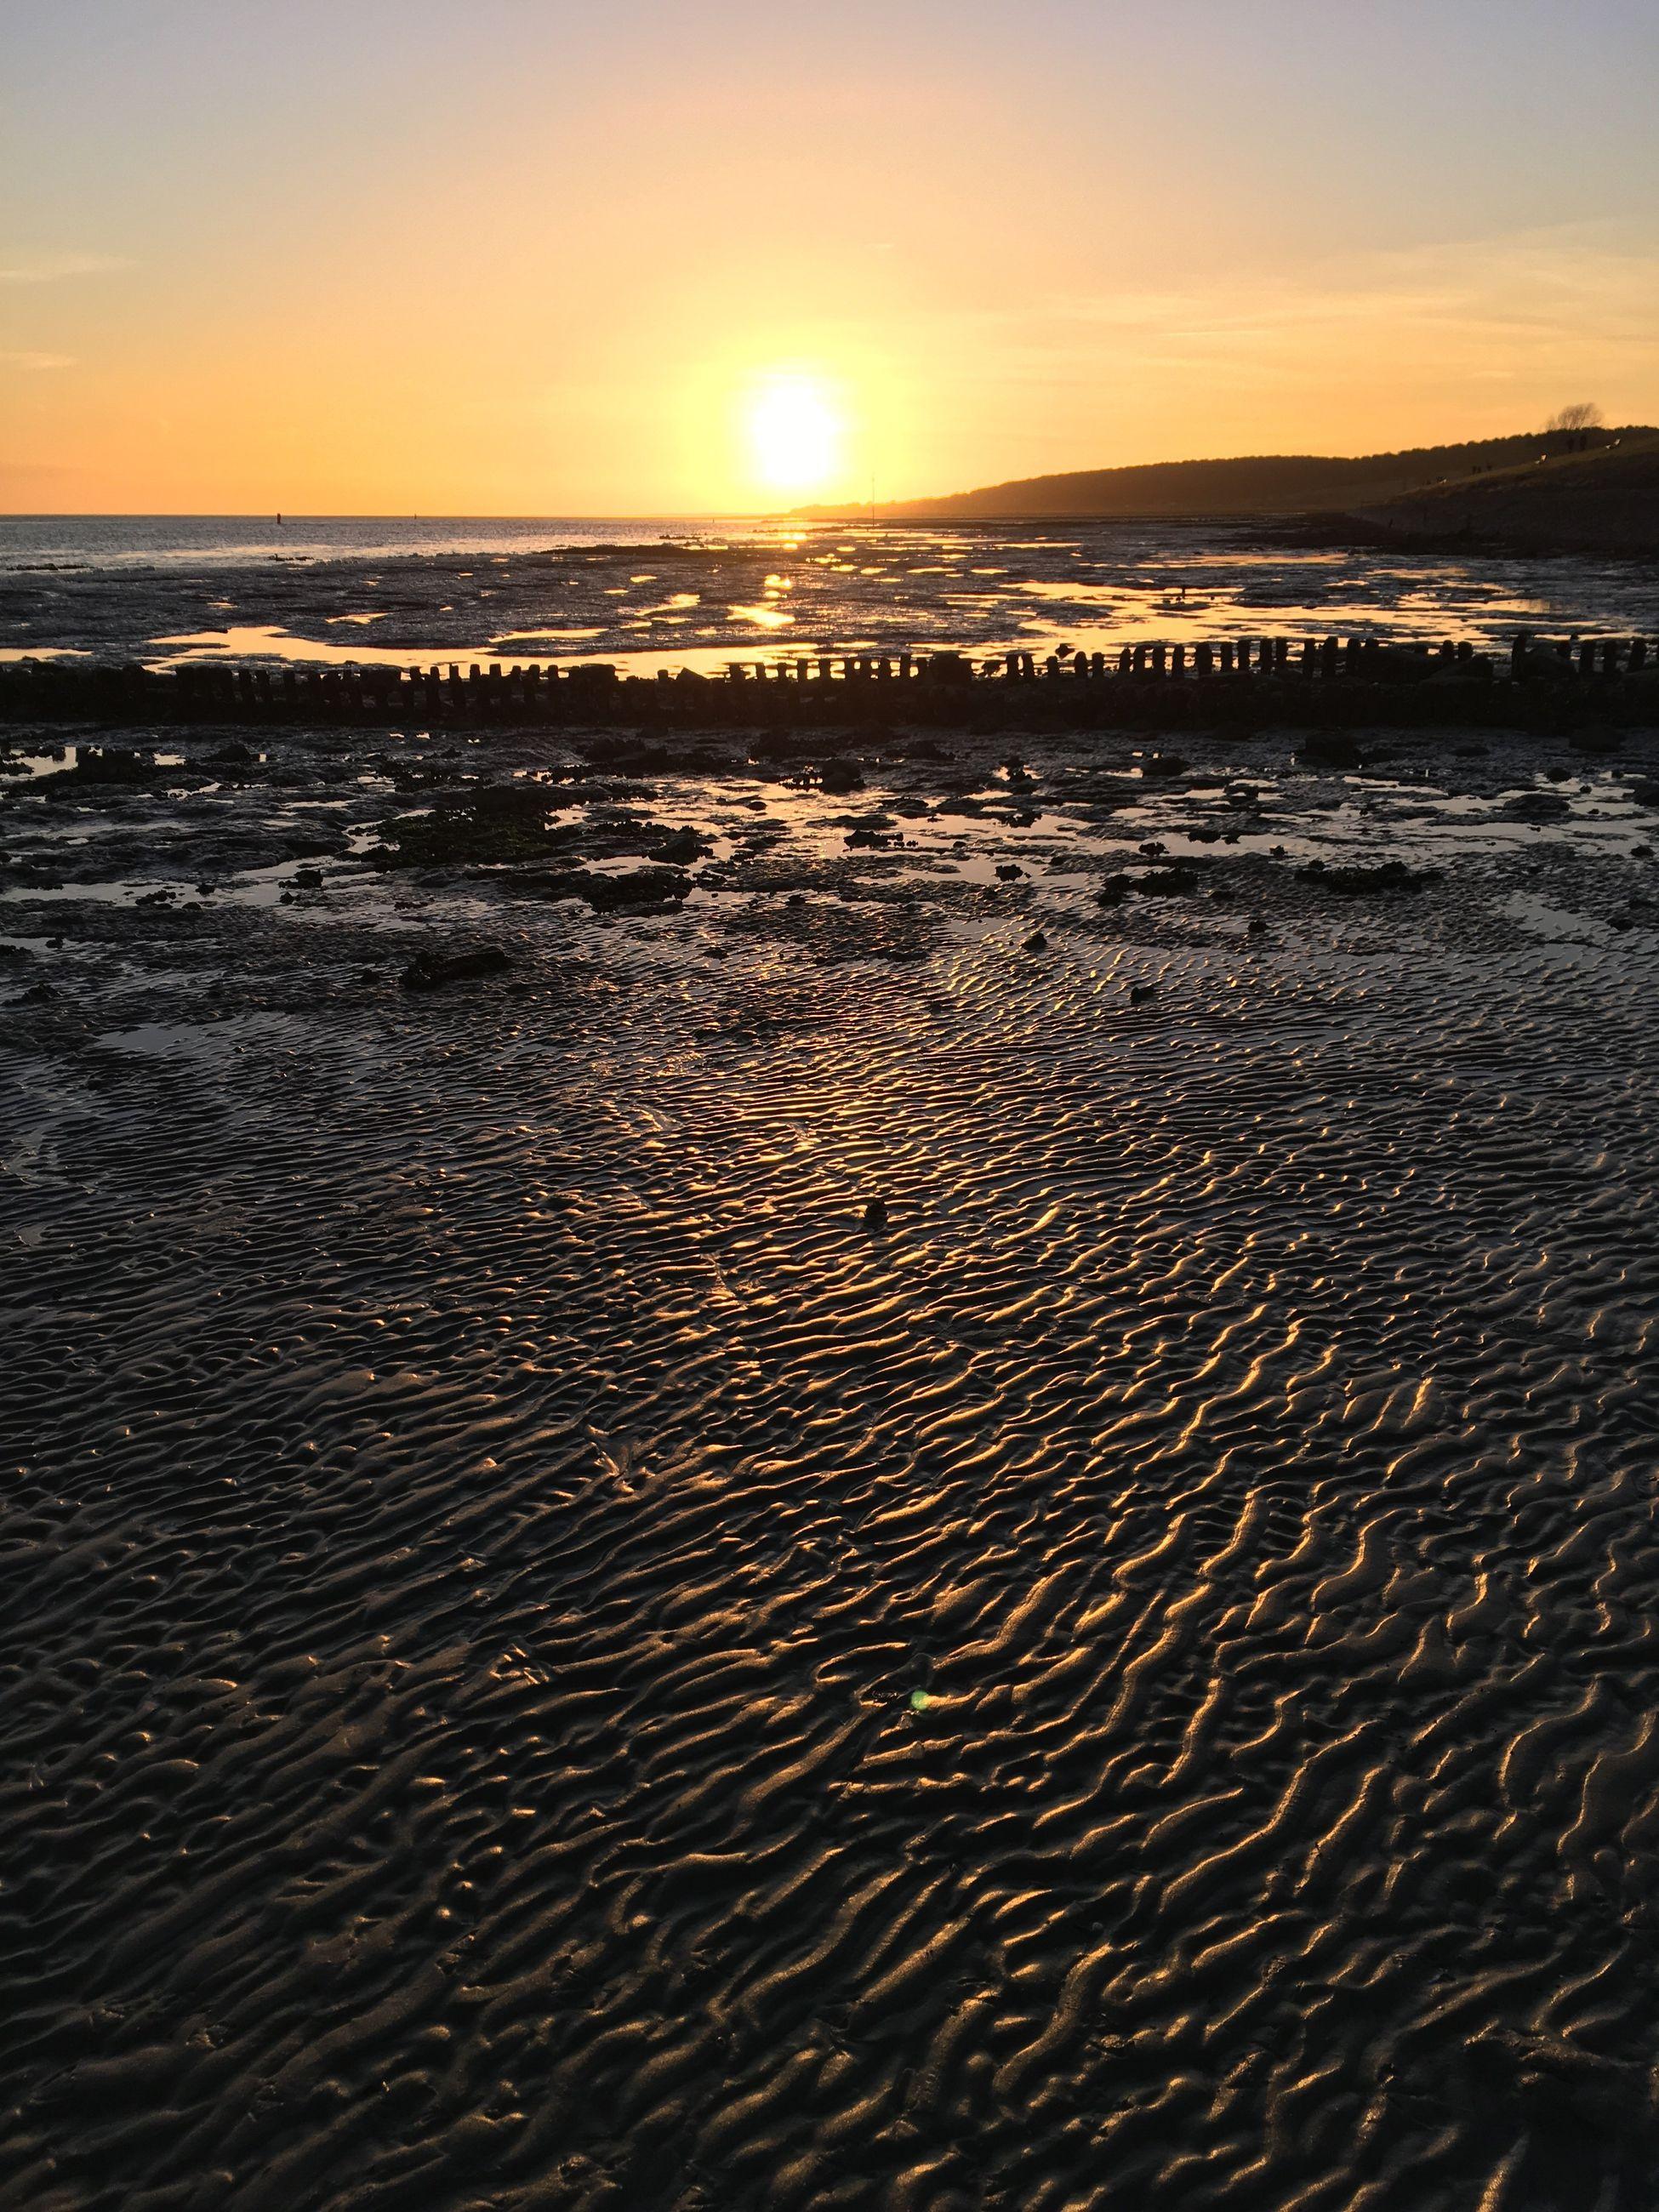 sunset, sky, beauty in nature, scenics - nature, water, land, tranquility, sea, beach, orange color, tranquil scene, nature, idyllic, horizon, sand, sunlight, non-urban scene, no people, horizon over water, sun, outdoors, low tide